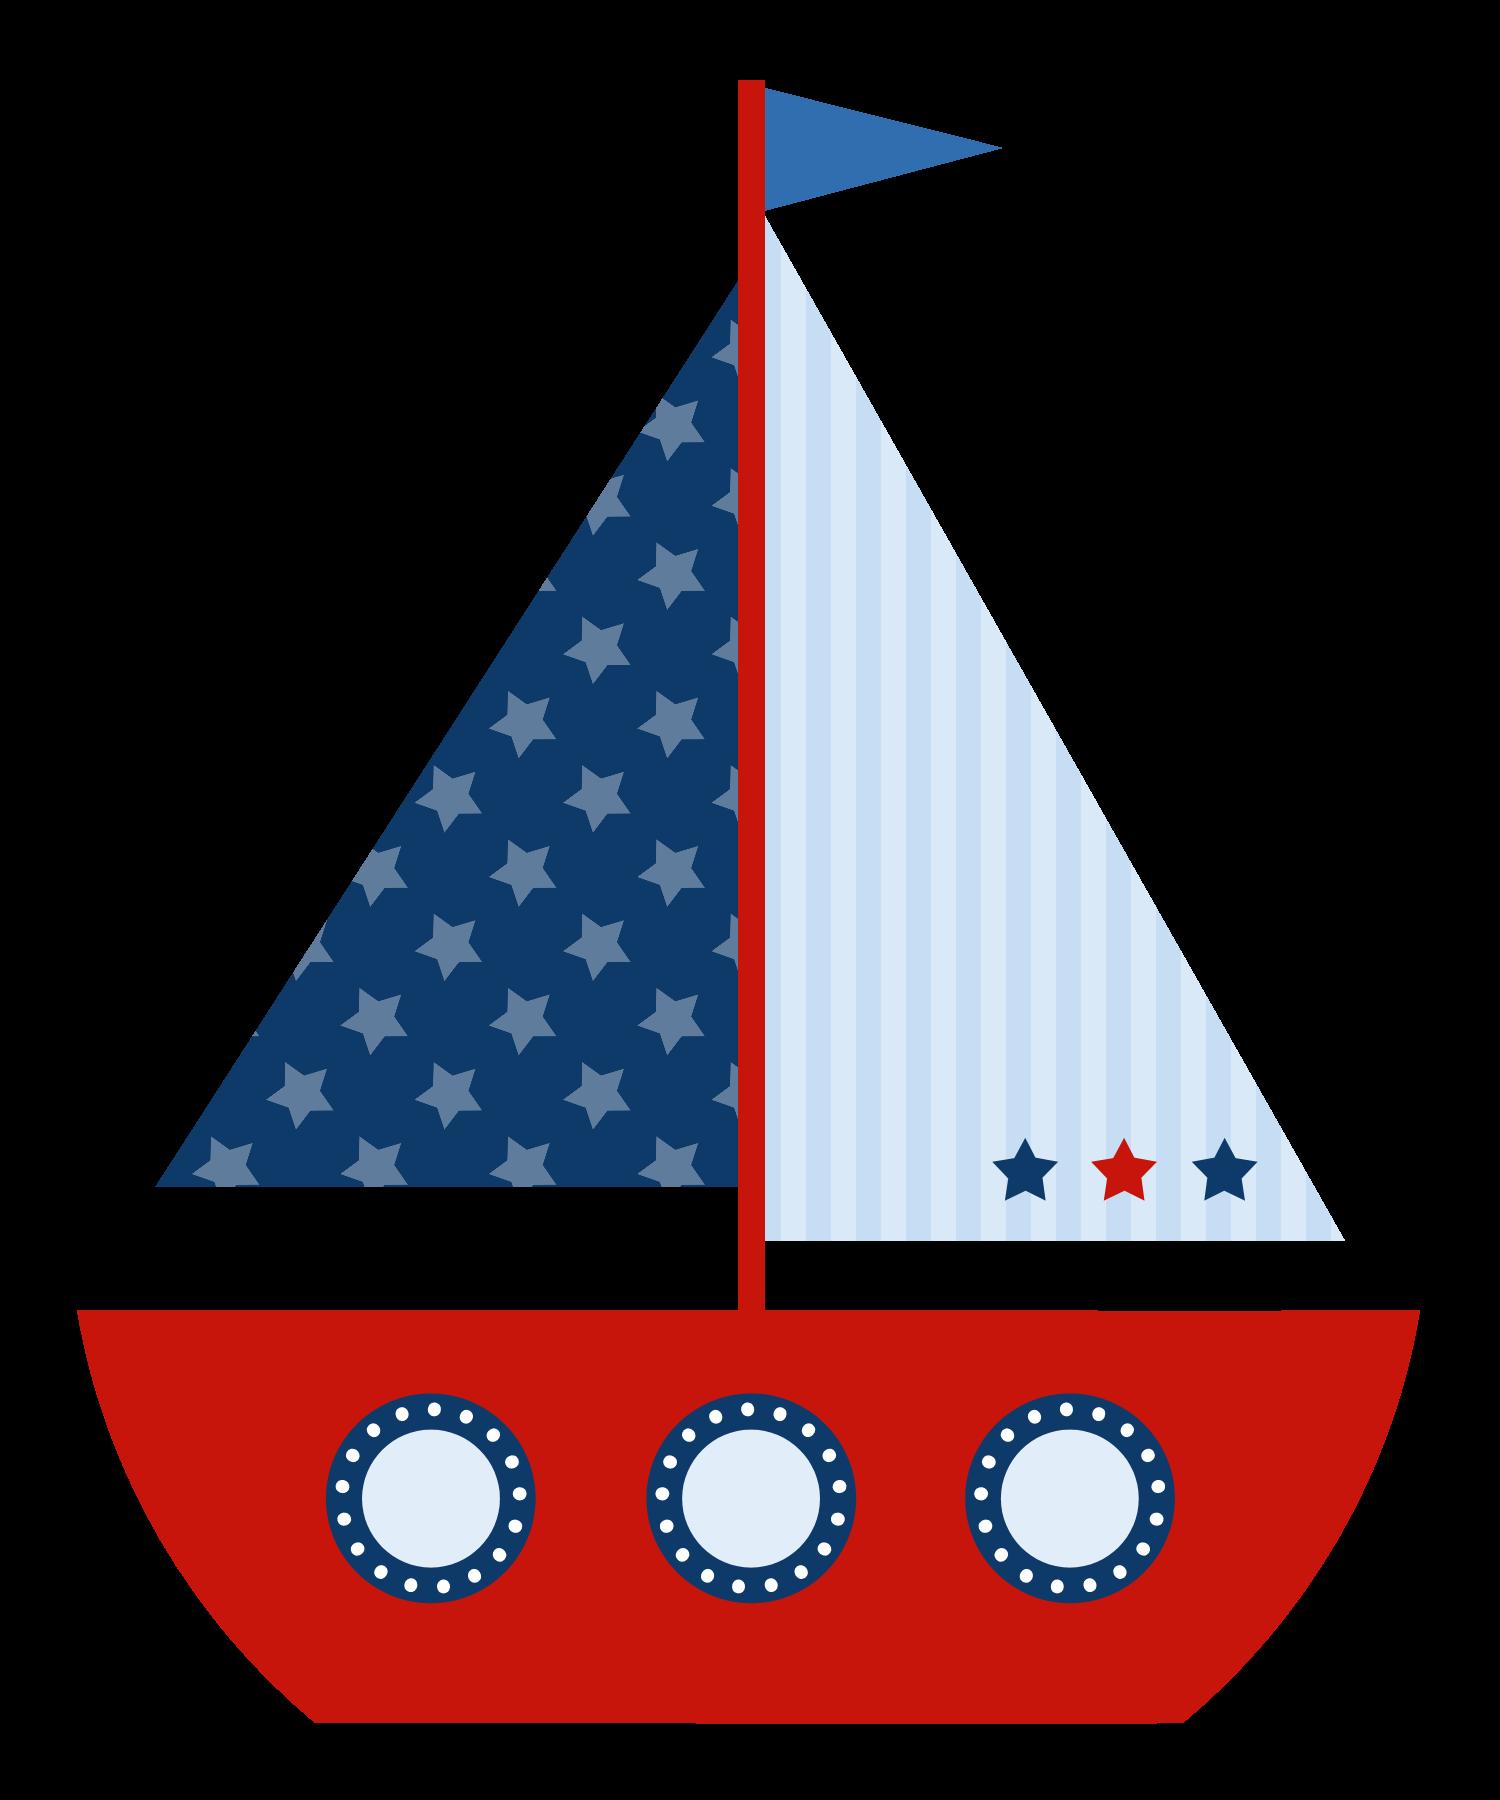 Free PNG Nautical - 74869